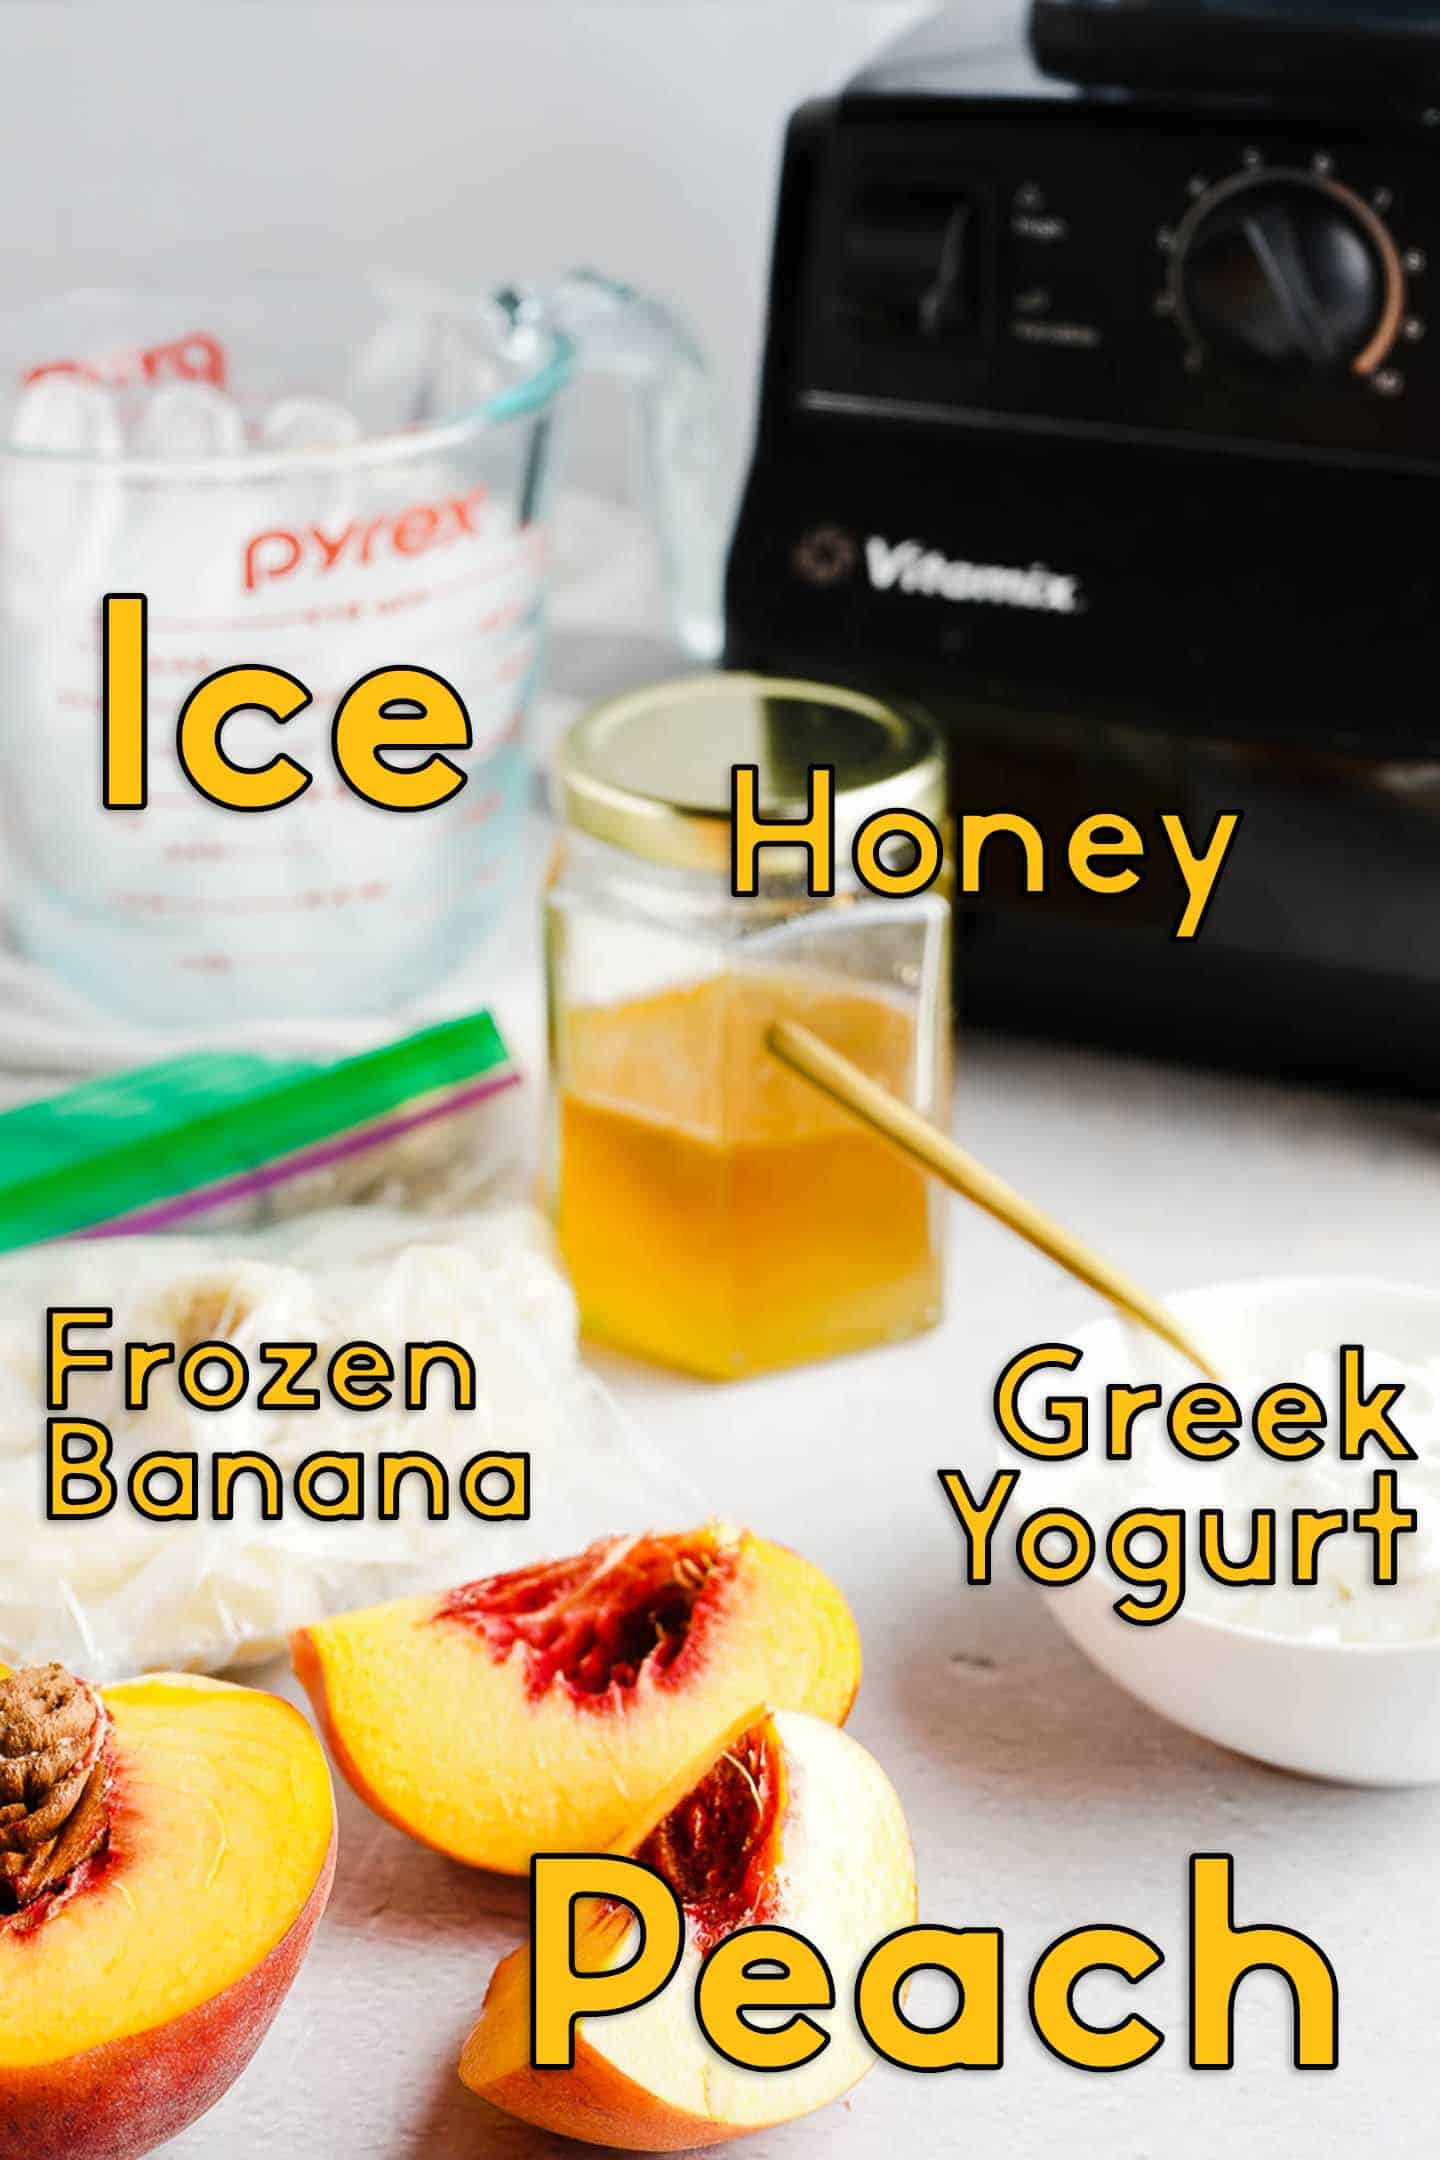 Ice Honey Peach Banana and Yogurt on Table